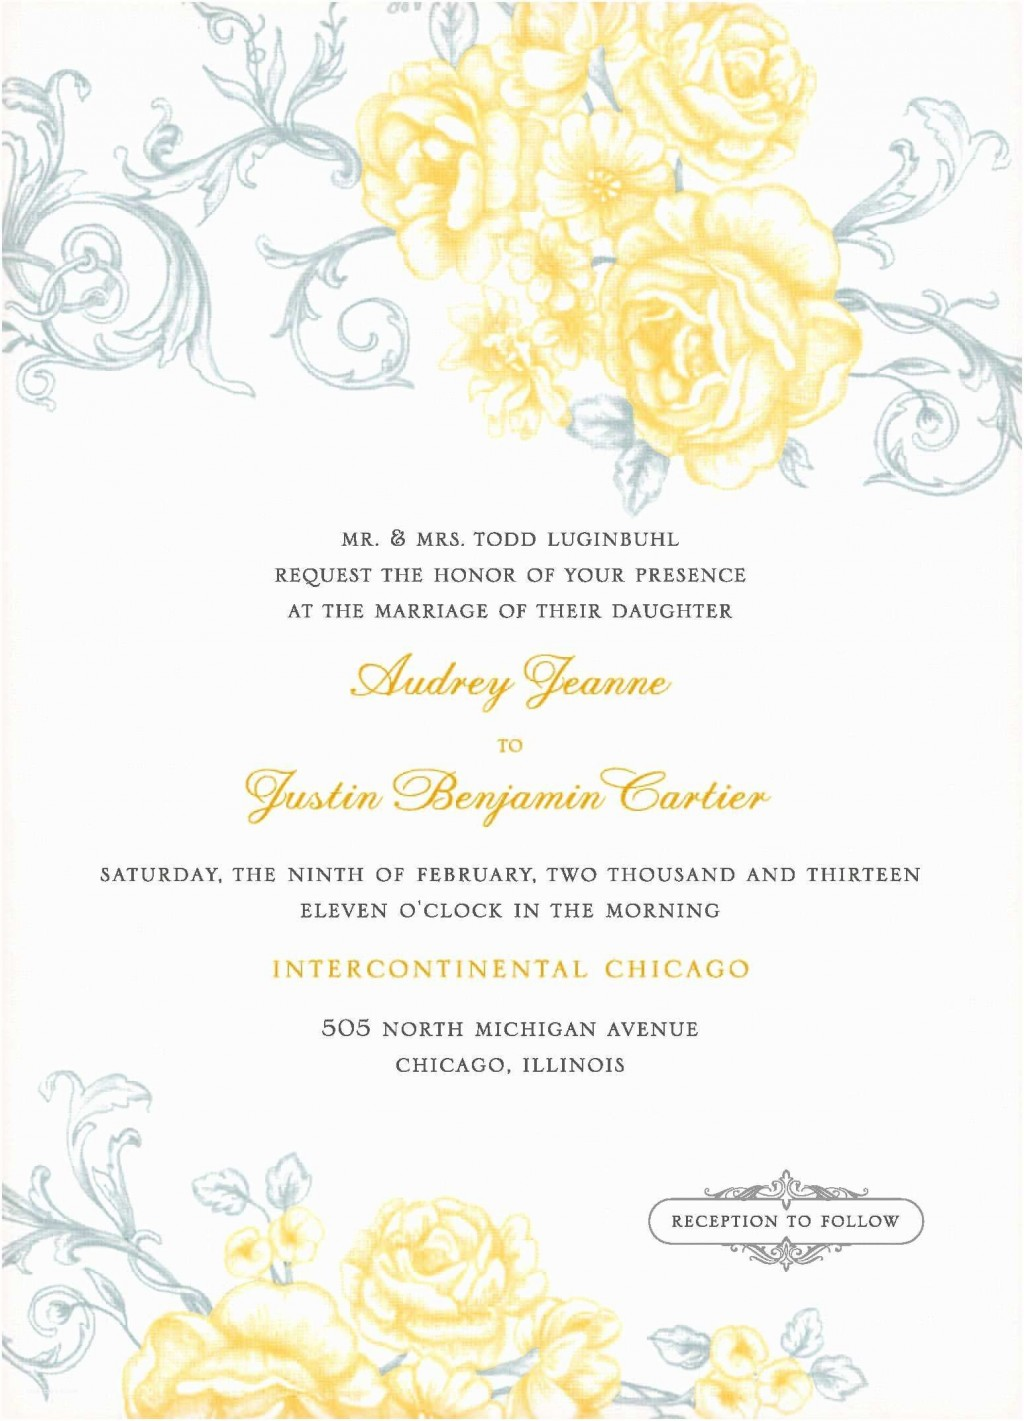 005 Impressive Free Wedding Template For Word Highest Clarity  Invitation In Marathi MenuLarge